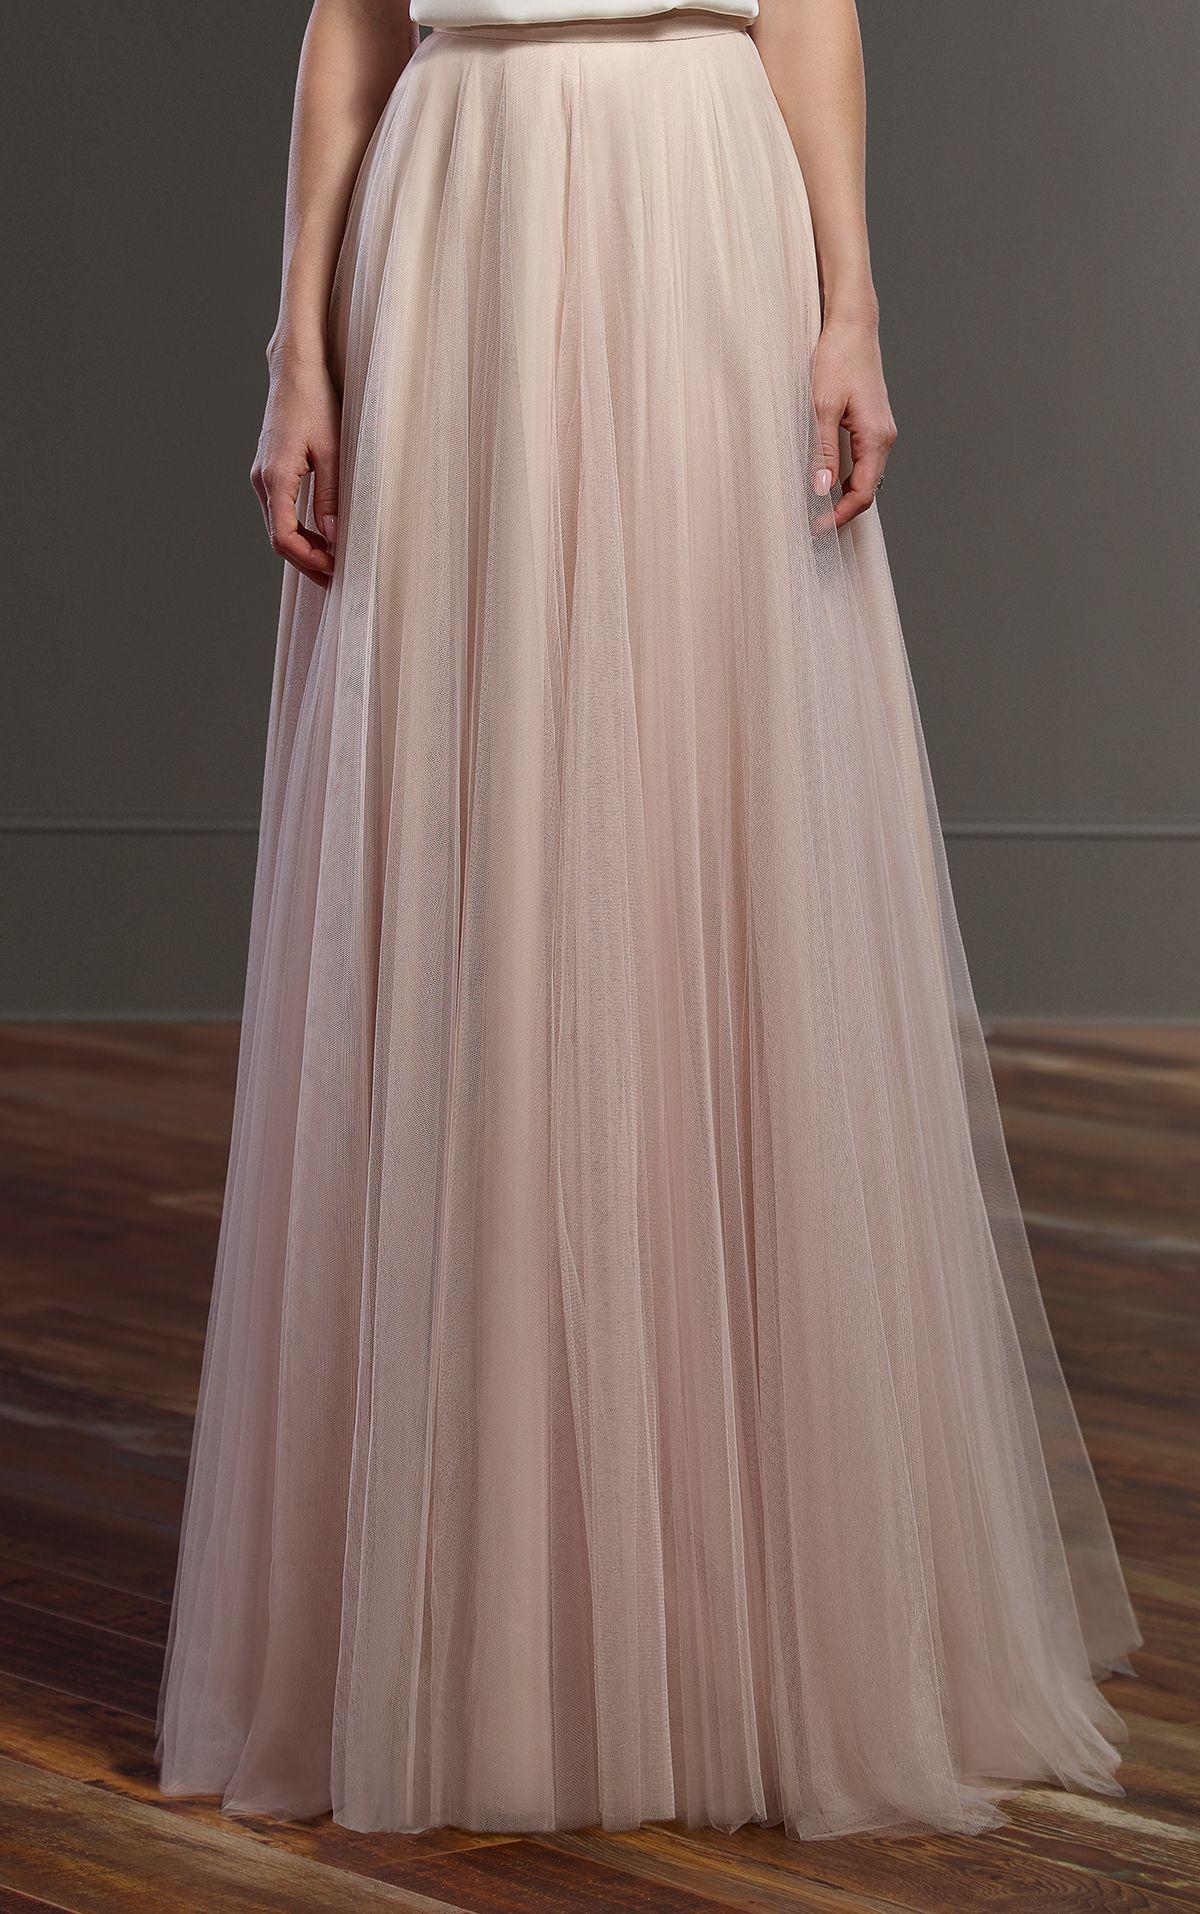 Boho wedding dresses wedding dress tulle wedding gown and wedding